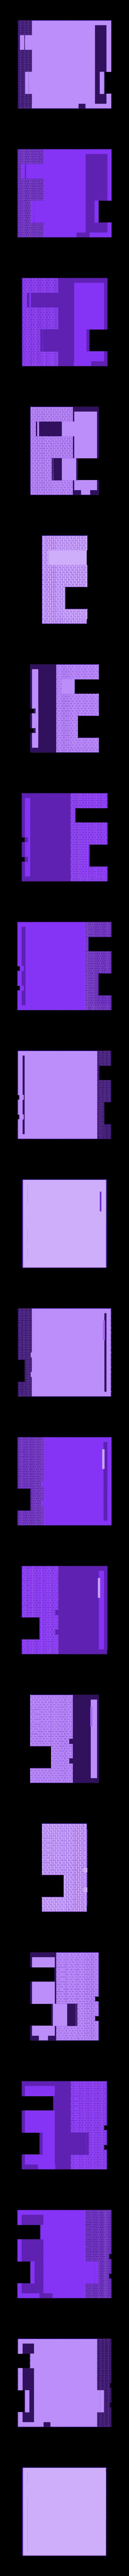 Post-Walls.stl Download free STL file Railway crossing post building H0 • Design to 3D print, polkin